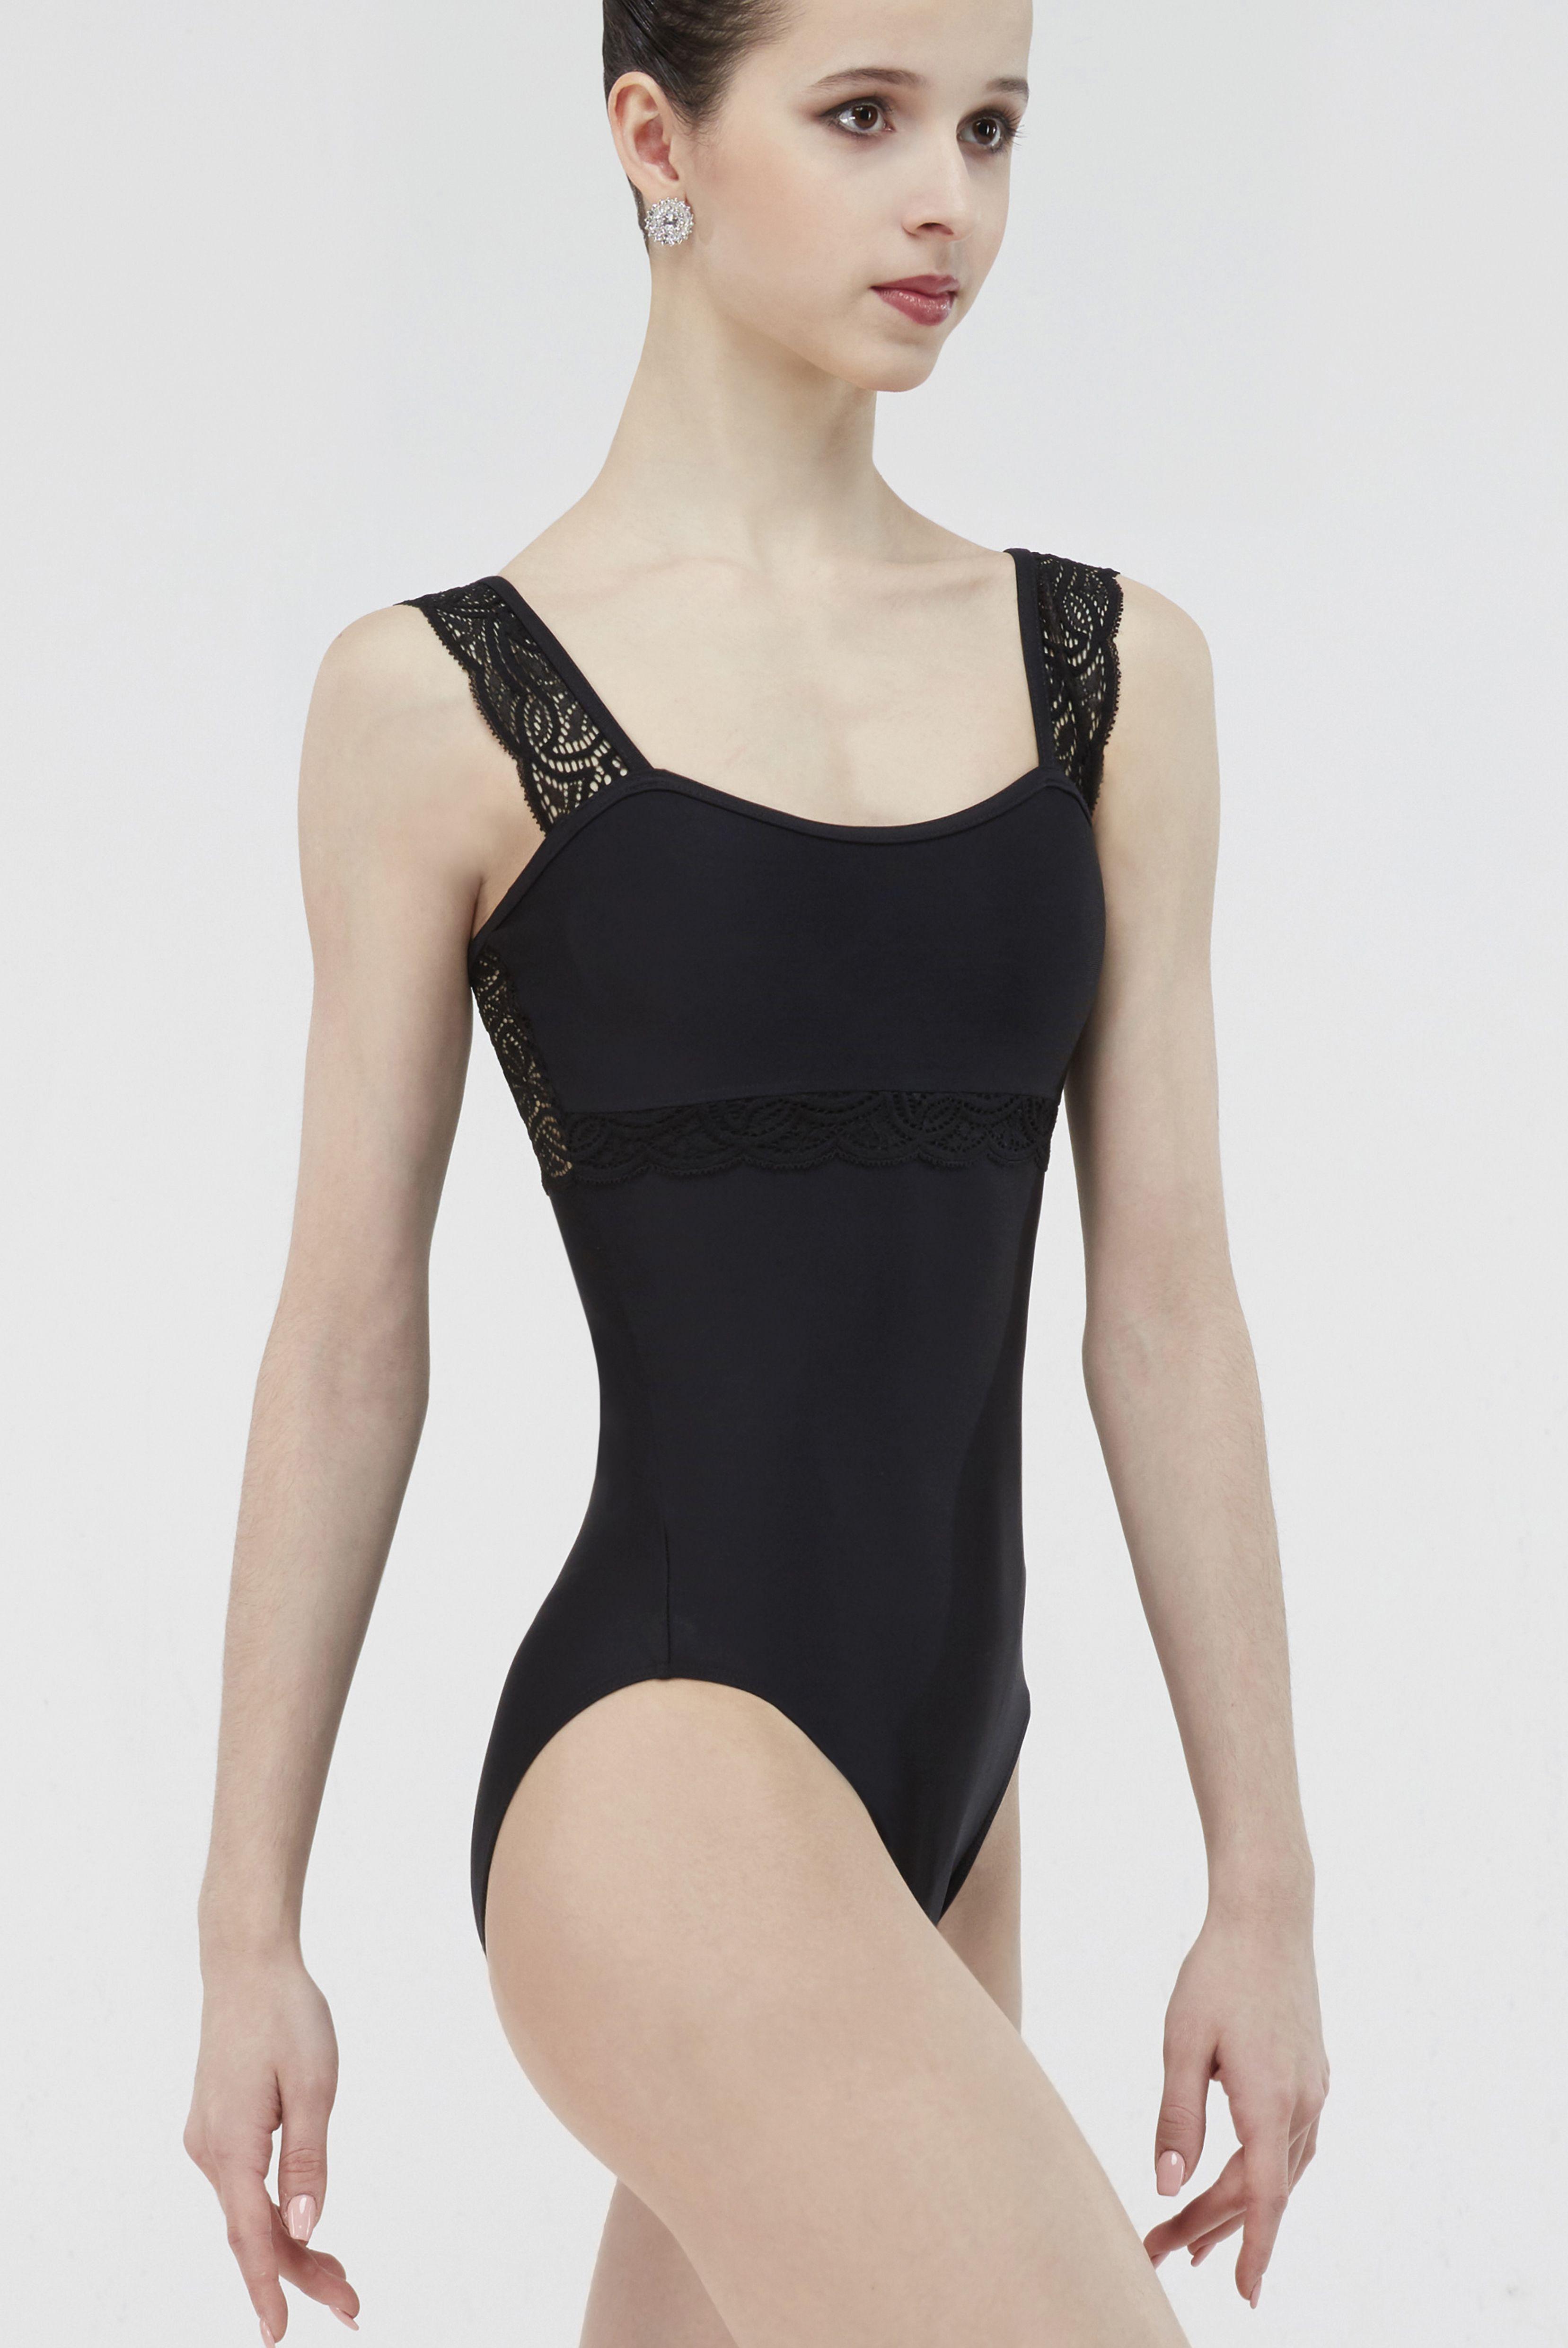 Women Ballet Leotard Lace Floral One Piece Bodysuit Dance Gymnastics Costume Top